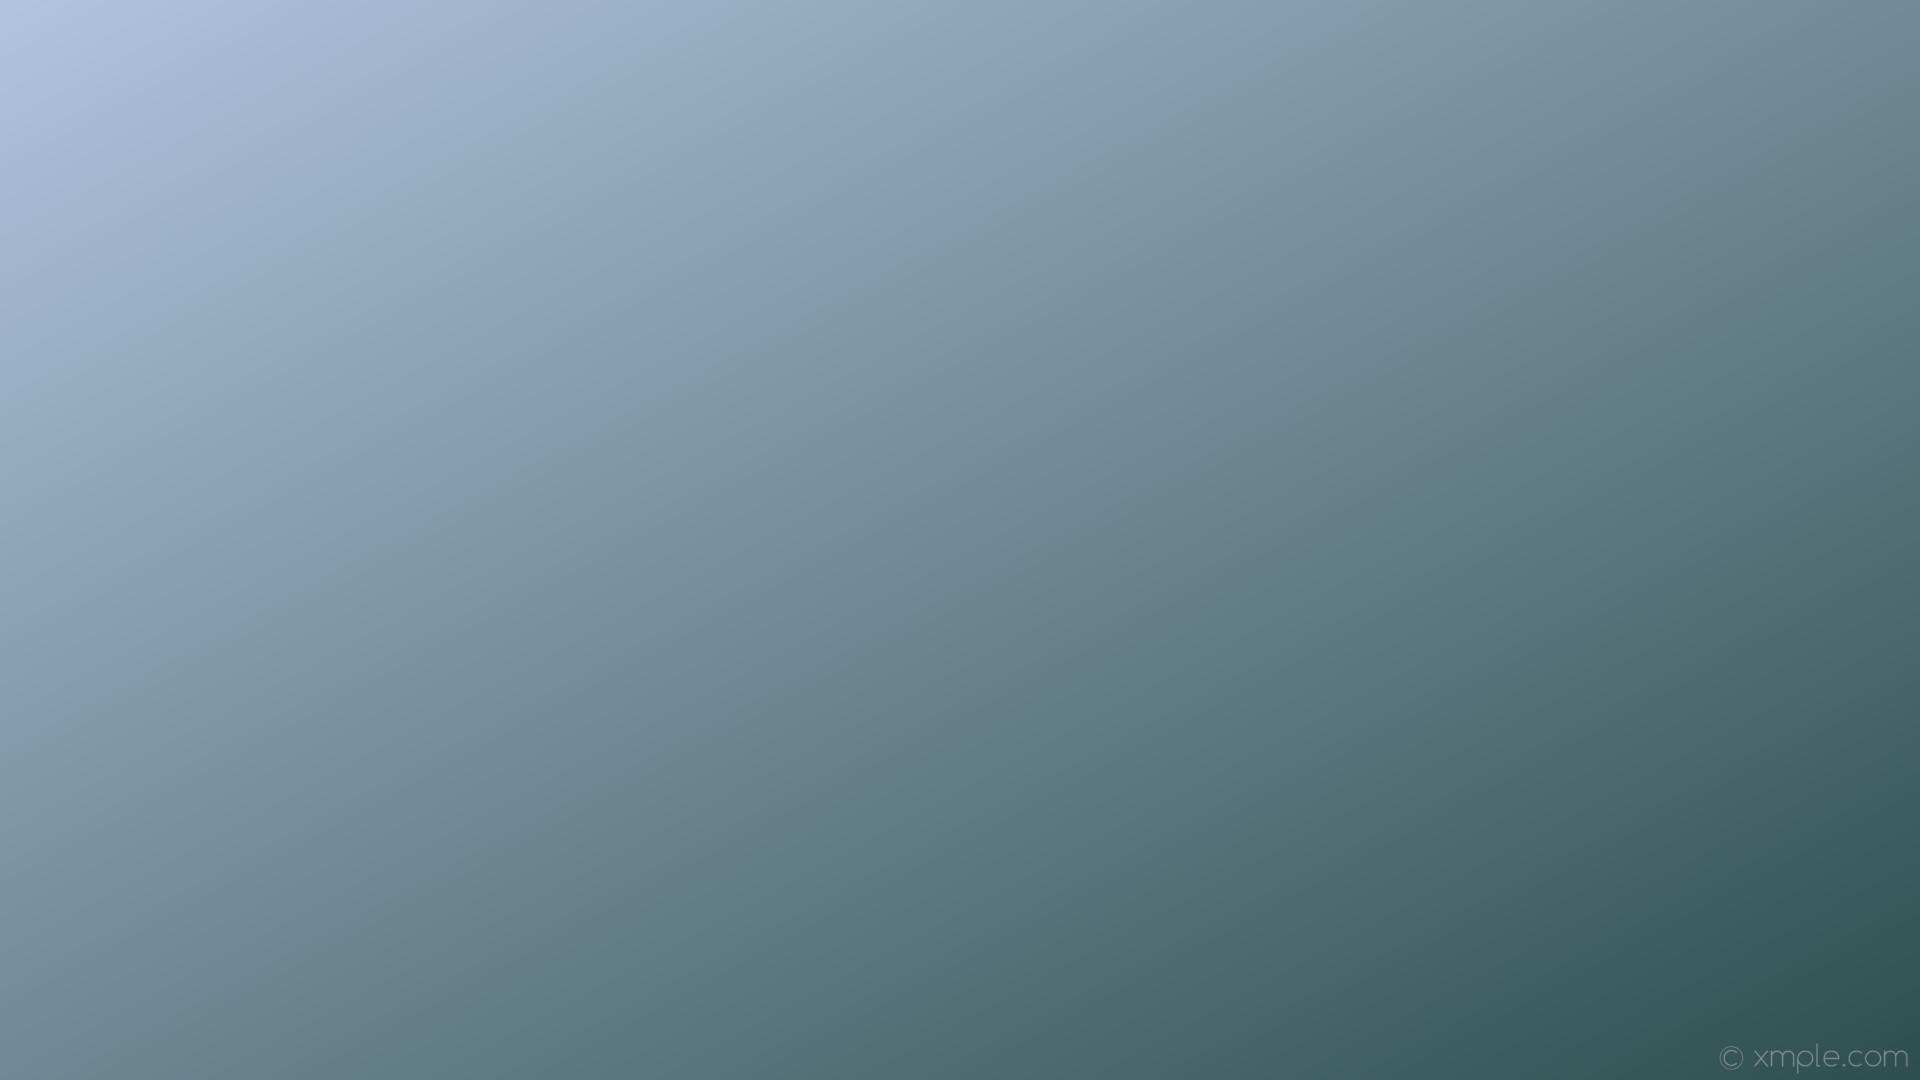 wallpaper linear gradient grey blue light steel blue dark slate gray  #b0c4de #2f4f4f 150